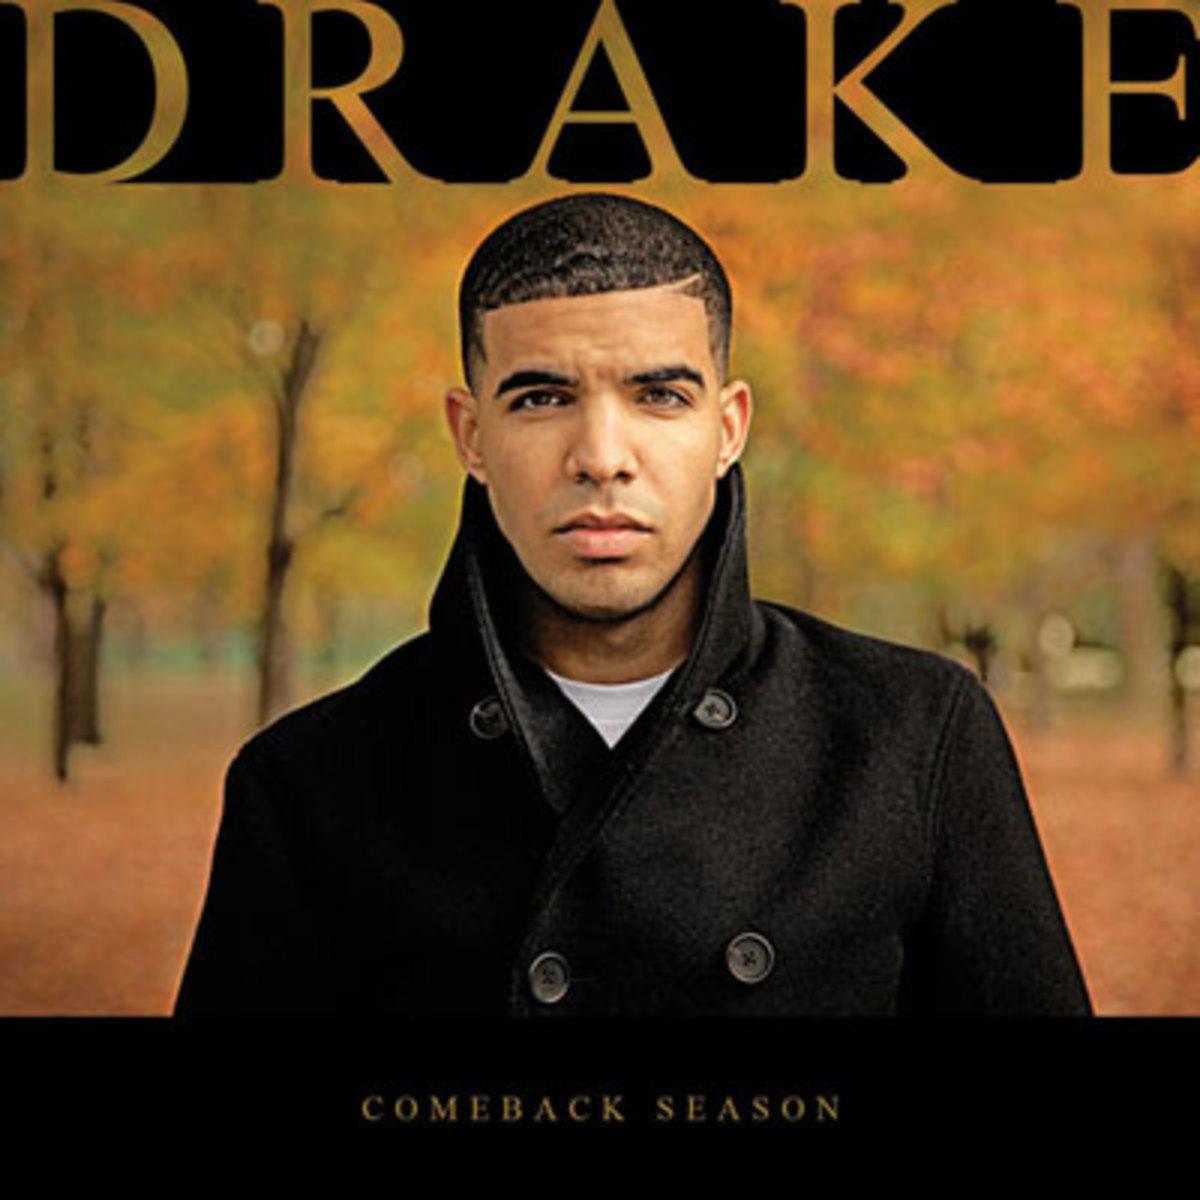 drake-comebackseason.jpg